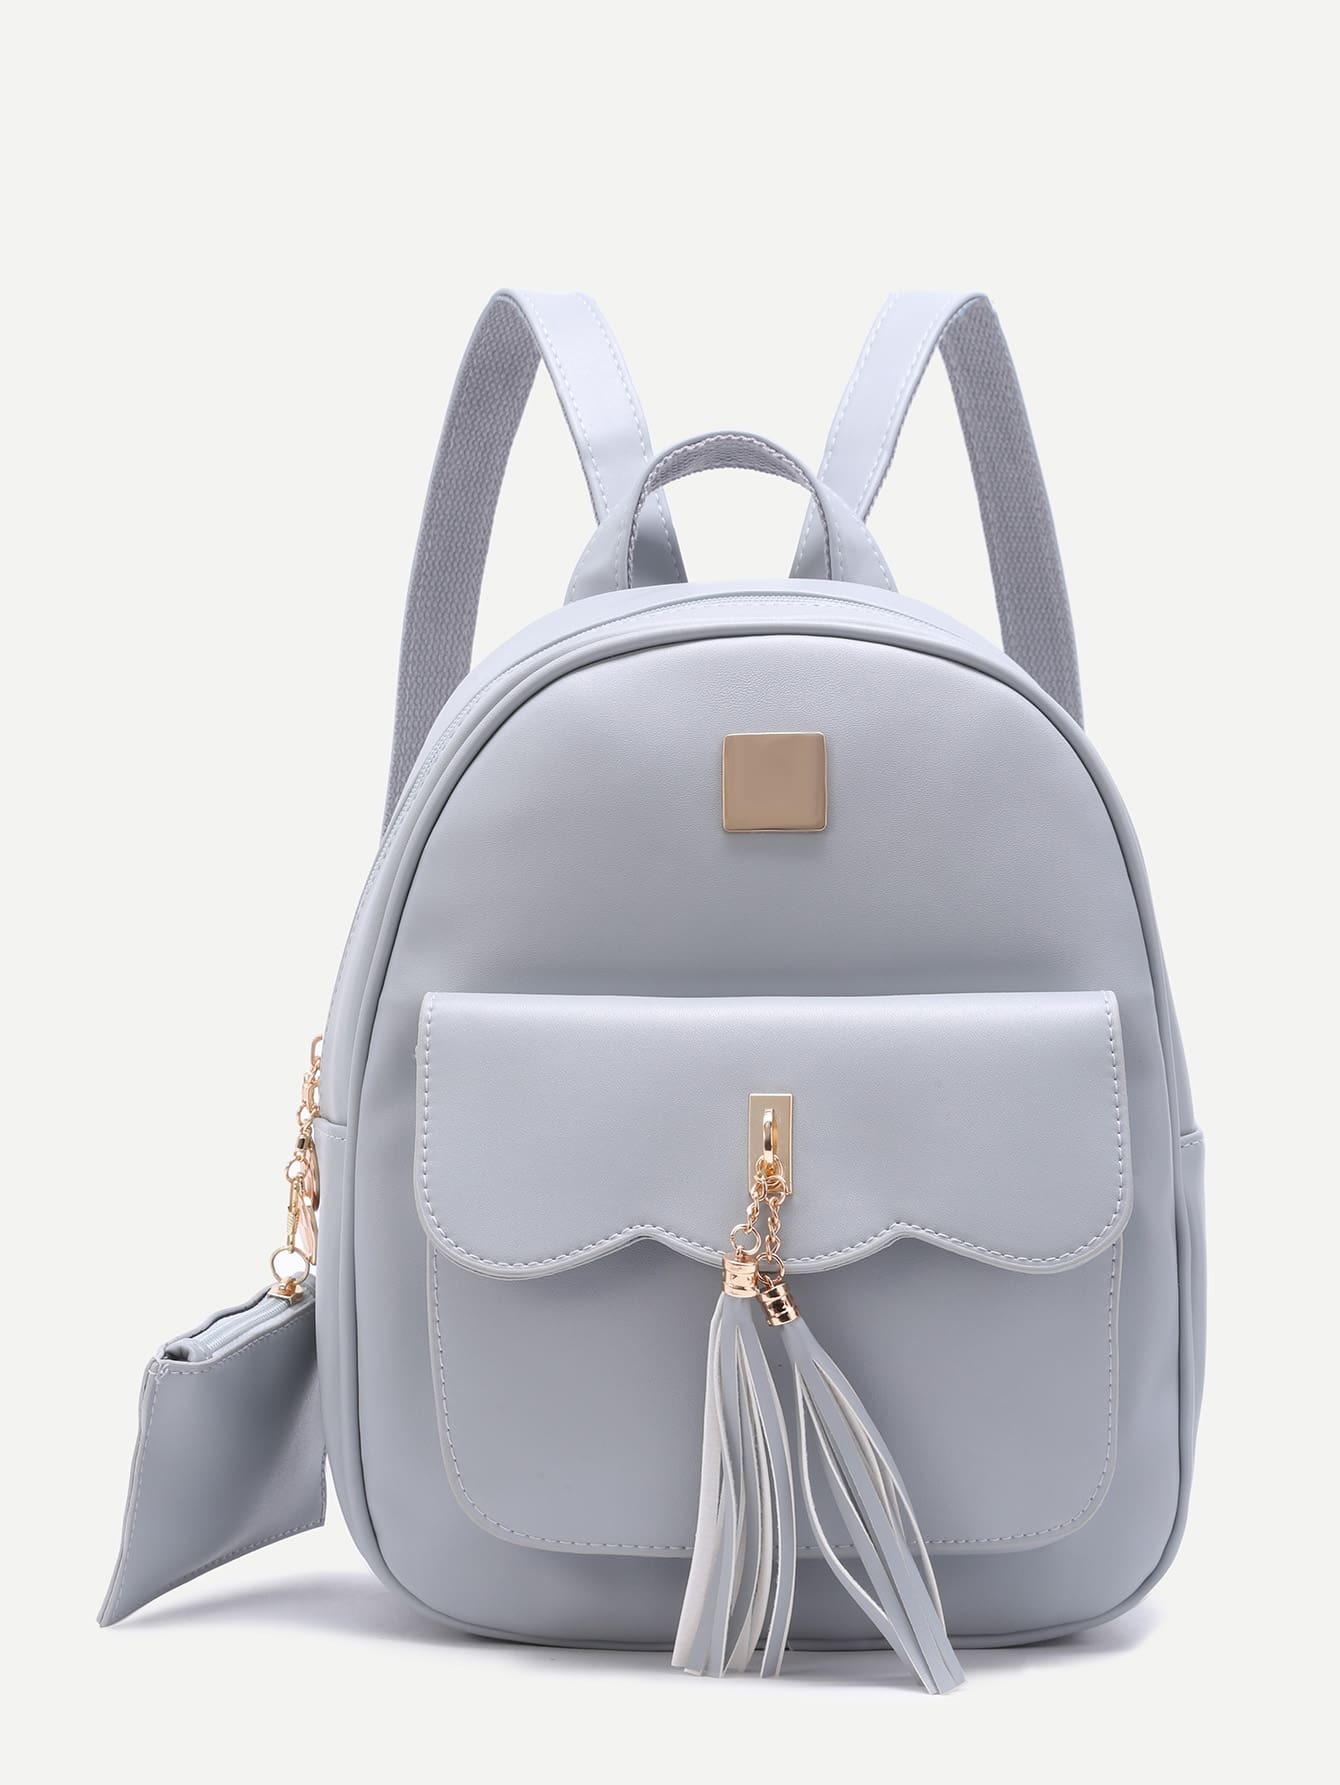 bag161125305_2